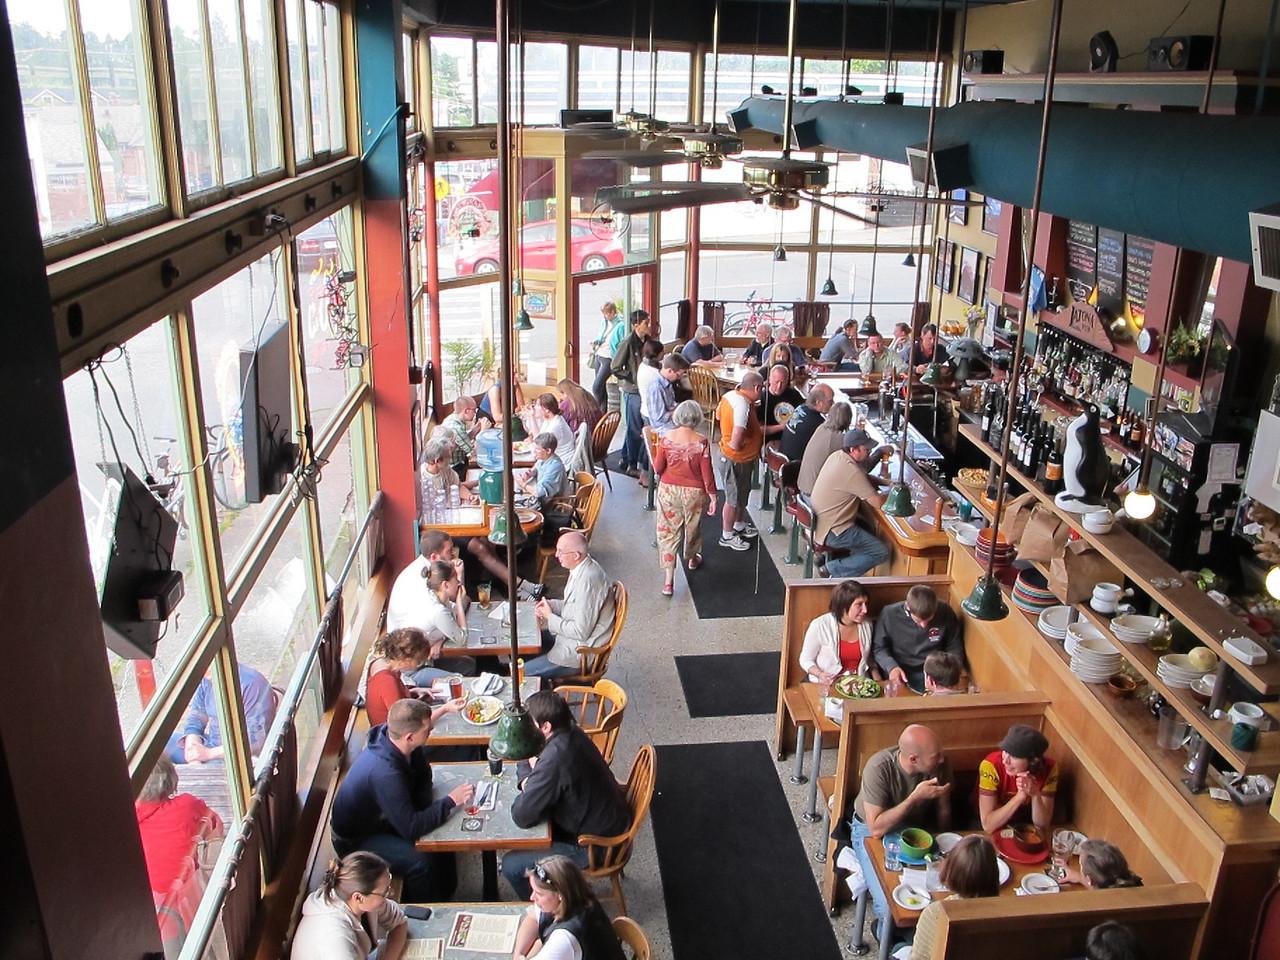 Thursday, June 23, 2011. The Letona Pub, one of the regular stops for our Thursday evening beer group.